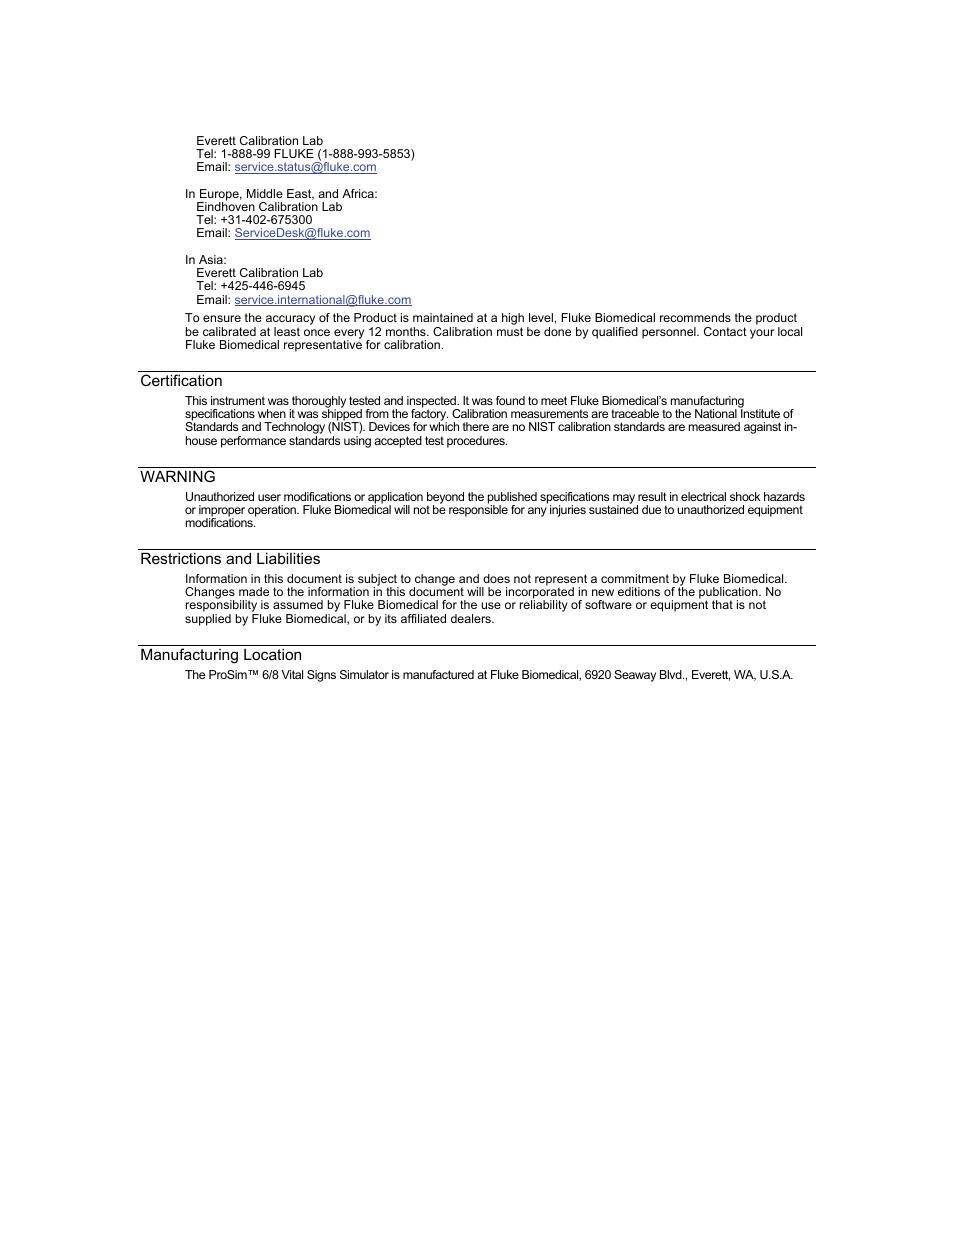 Fluke Biomedical ProSim 6 User Manual | Page 4 / 102 | Also for